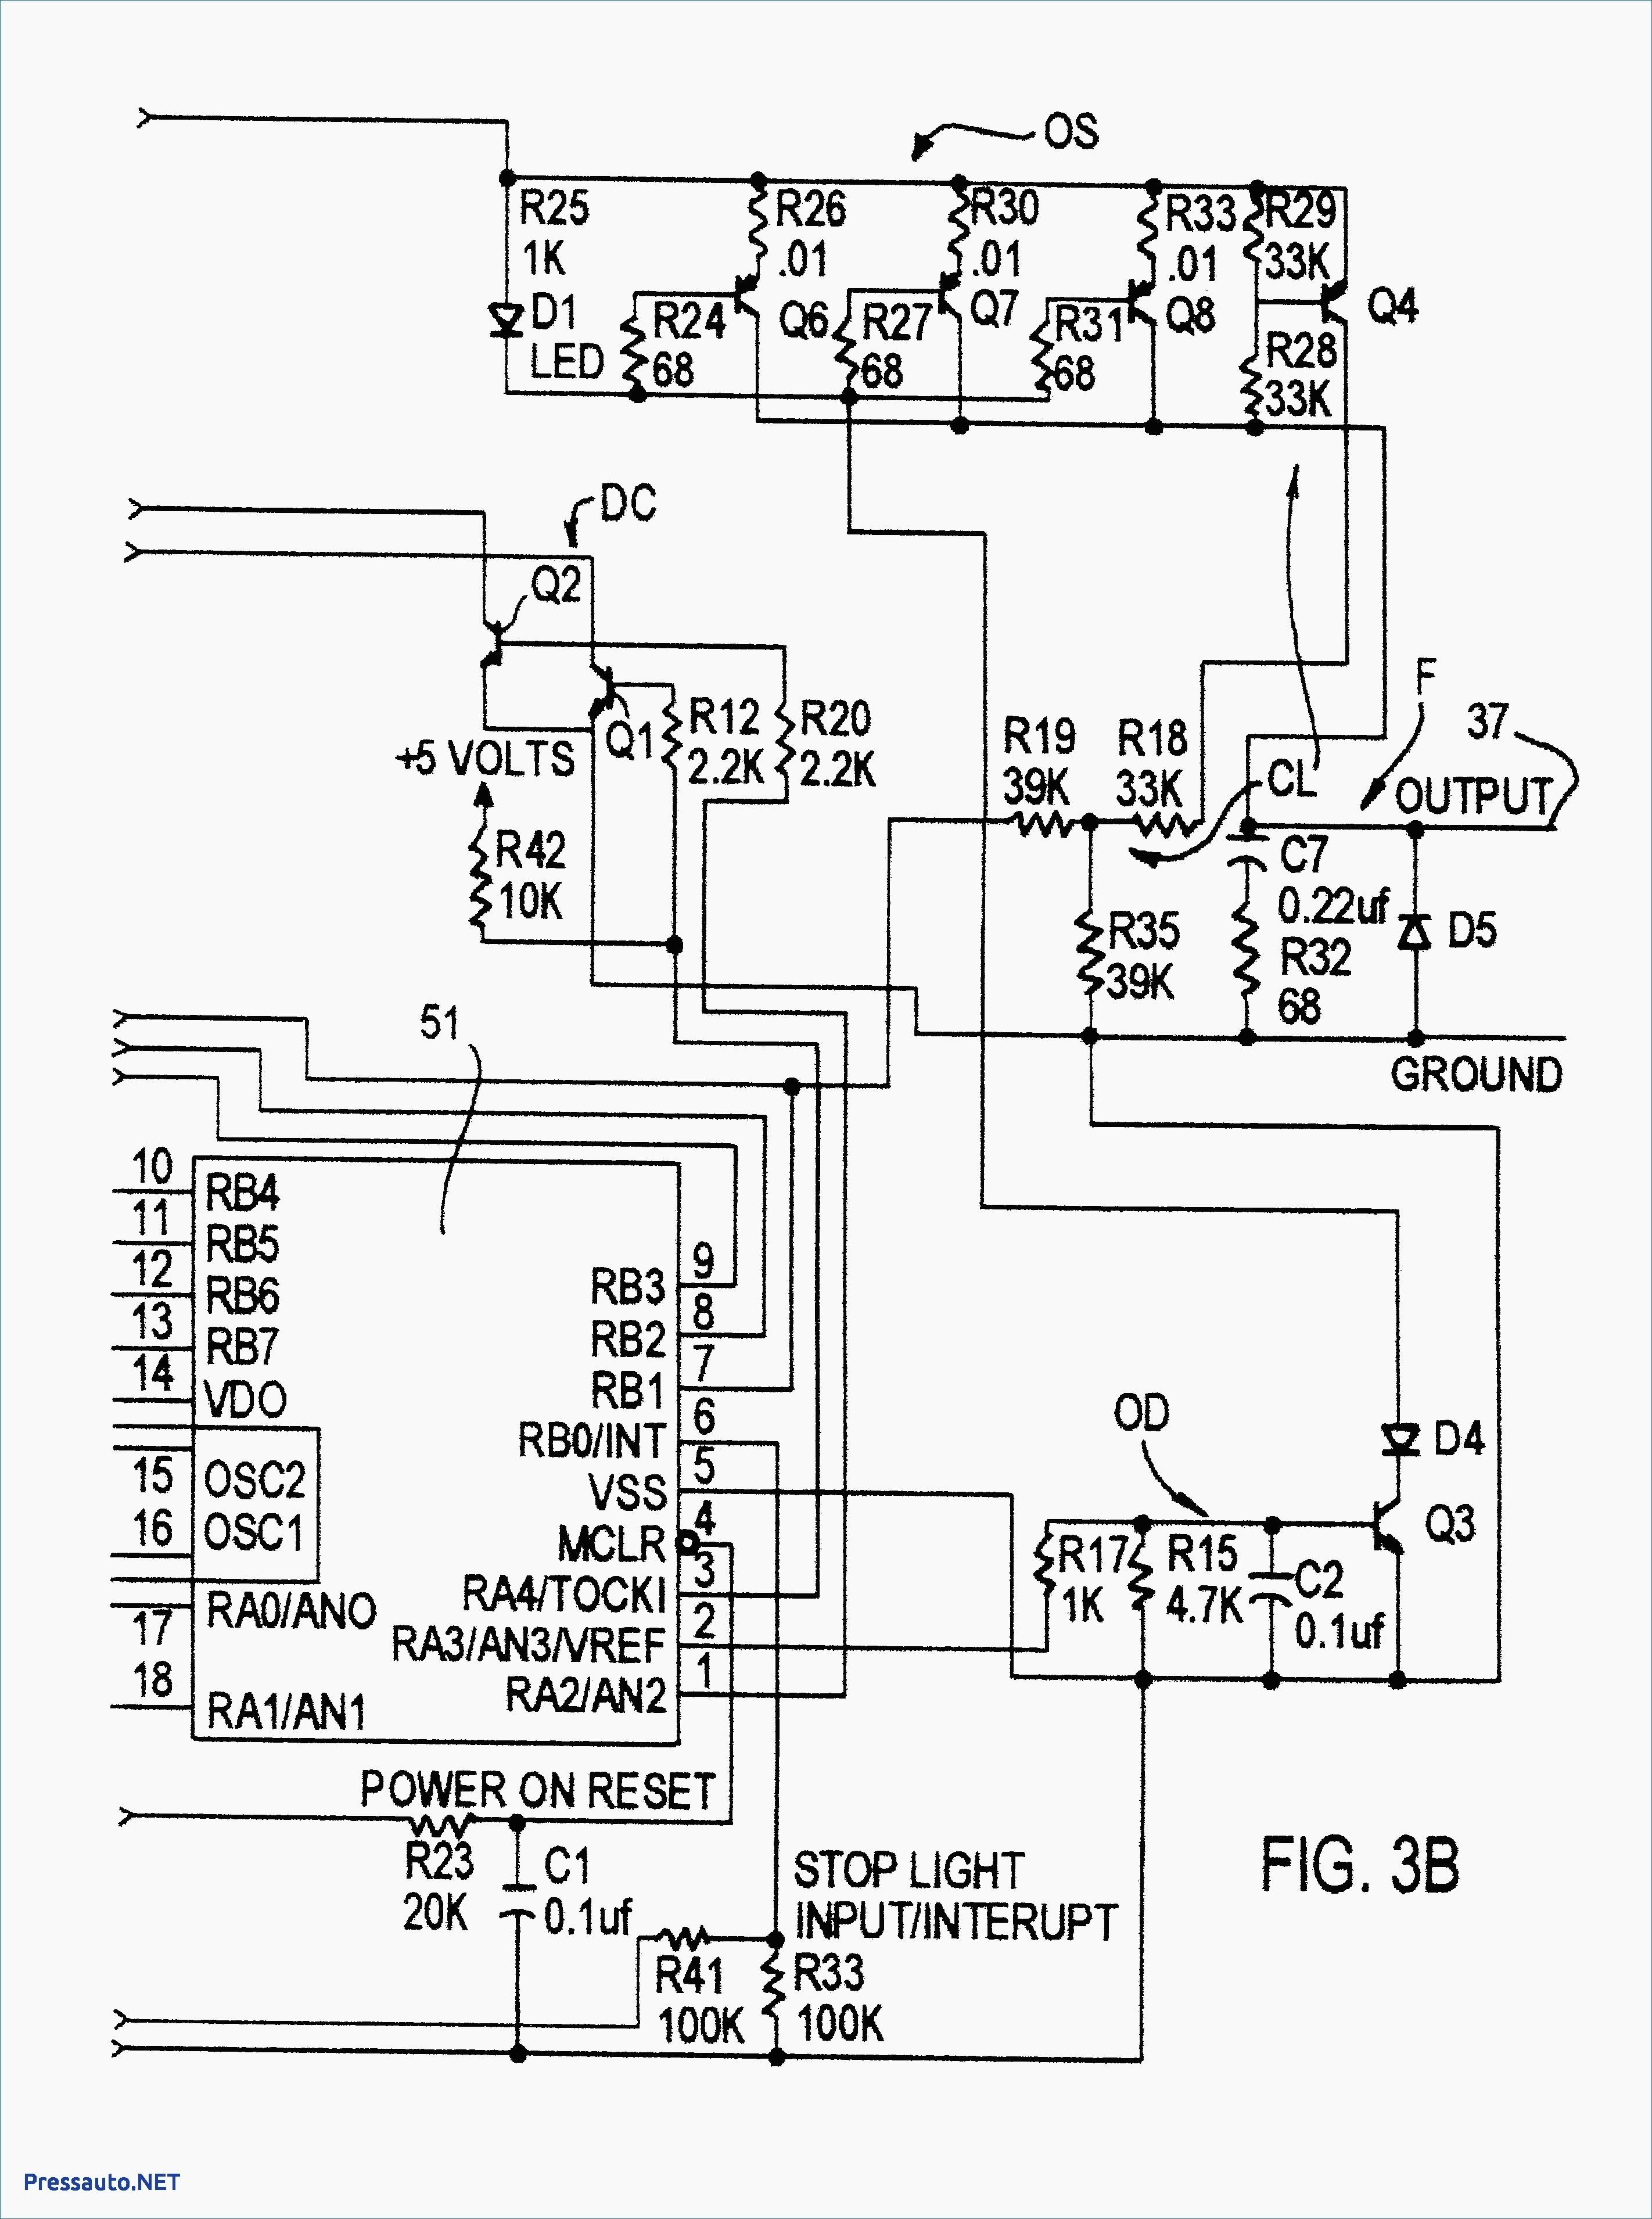 2001 mitsubishi galant engine diagram schematic wiring diagram 1991 Miata Wiring Diagram PDF 2001 mitsubishi galant engine diagram wiring diagram all data 2000 4 cylinder 2 4 l mitsubishi galant belt diagram 2001 mitsubishi galant engine diagram